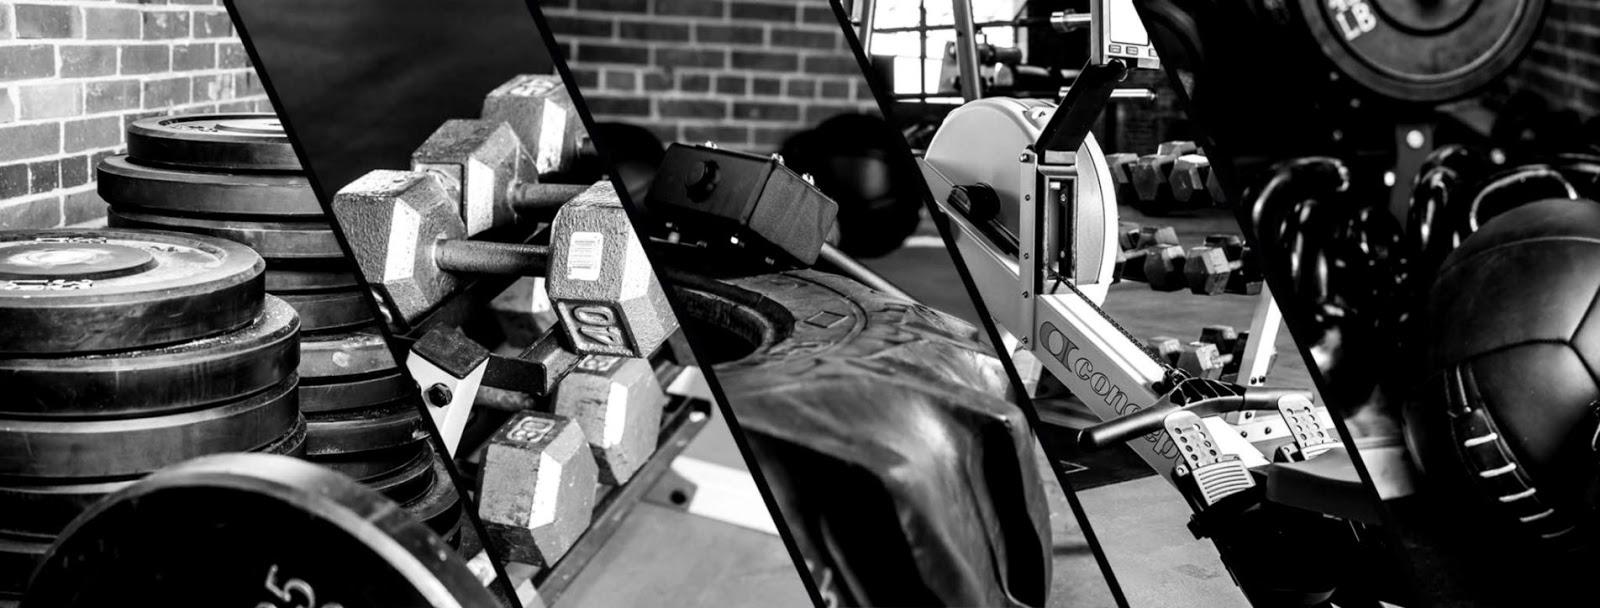 Fitnessstudio wallpaper  Crossfit Straubing # Das Original # Elite Fitness – Training